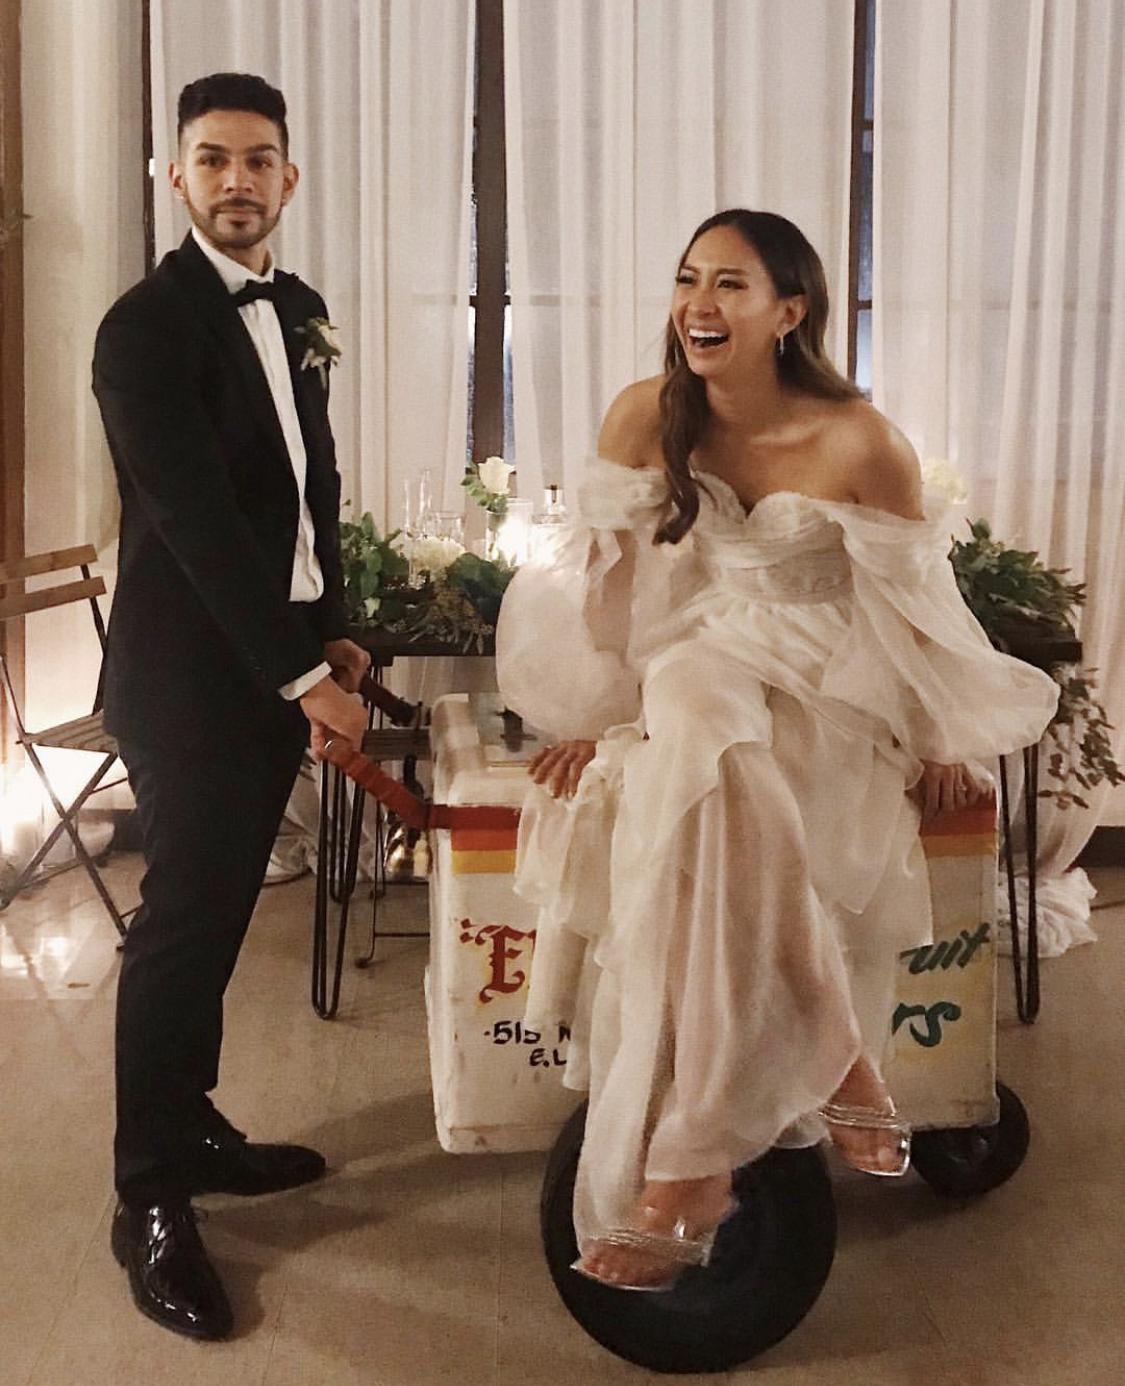 TIFFANY GOMEZ'S WEDDING DRESS - DESIGNED BY JOHN DE PERALTA